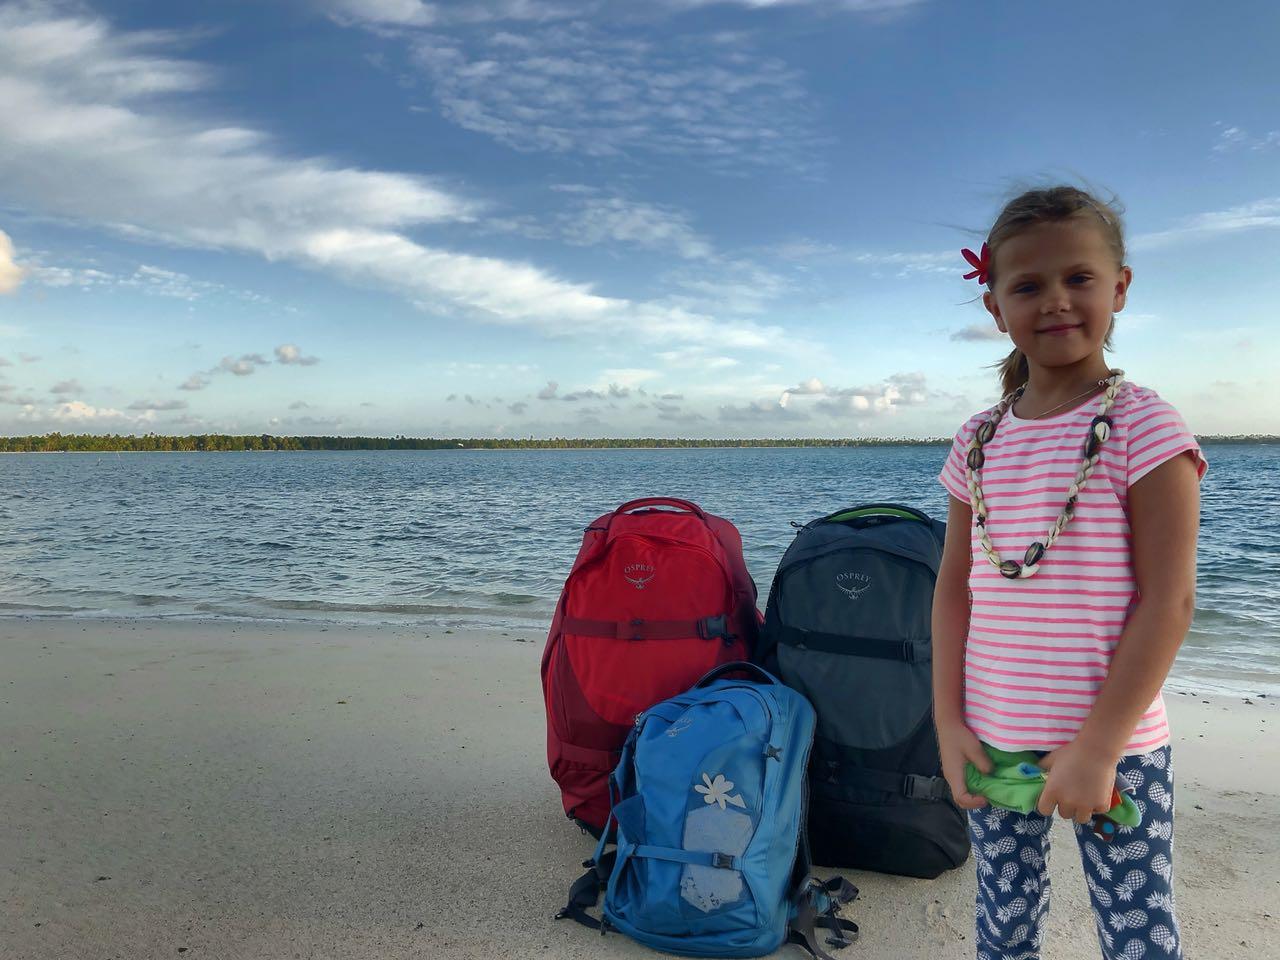 Abholung vom Strand auf Maupiti